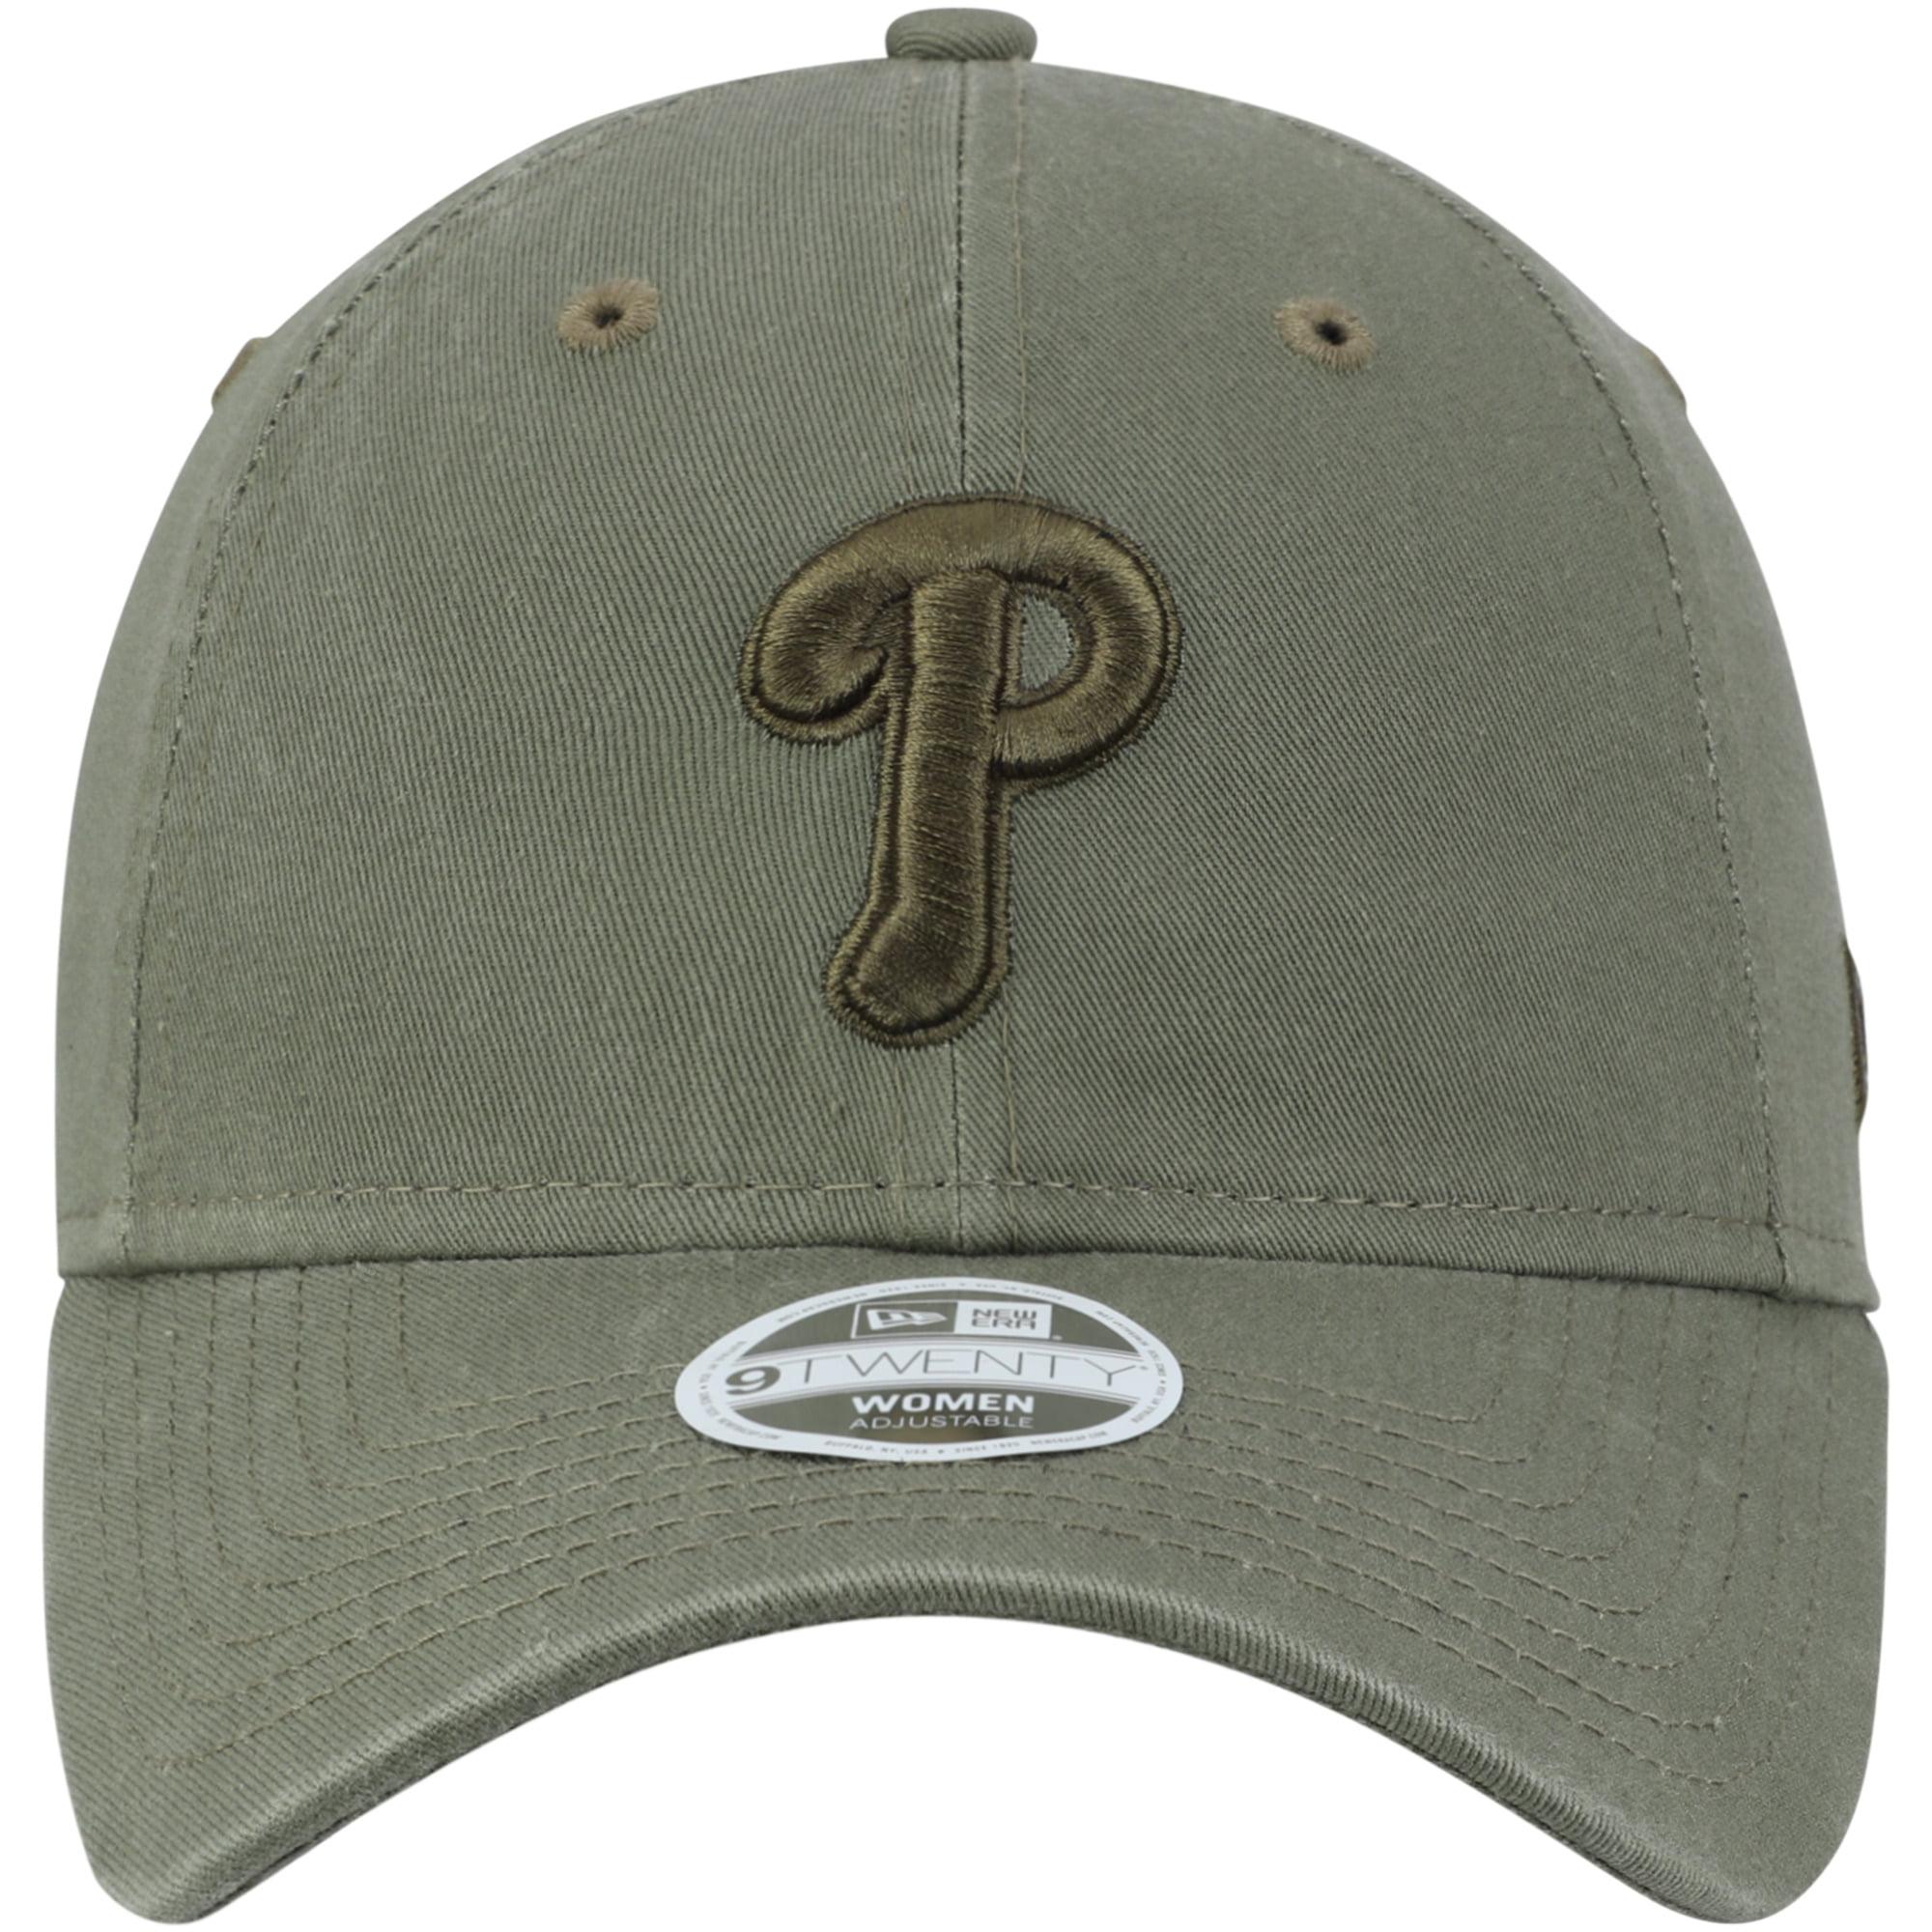 buy popular d7261 c7289 Philadelphia Phillies New Era Women s Bark Tonal Core Classic 9TWENTY  Adjustable Hat - Olive - OSFA - Walmart.com